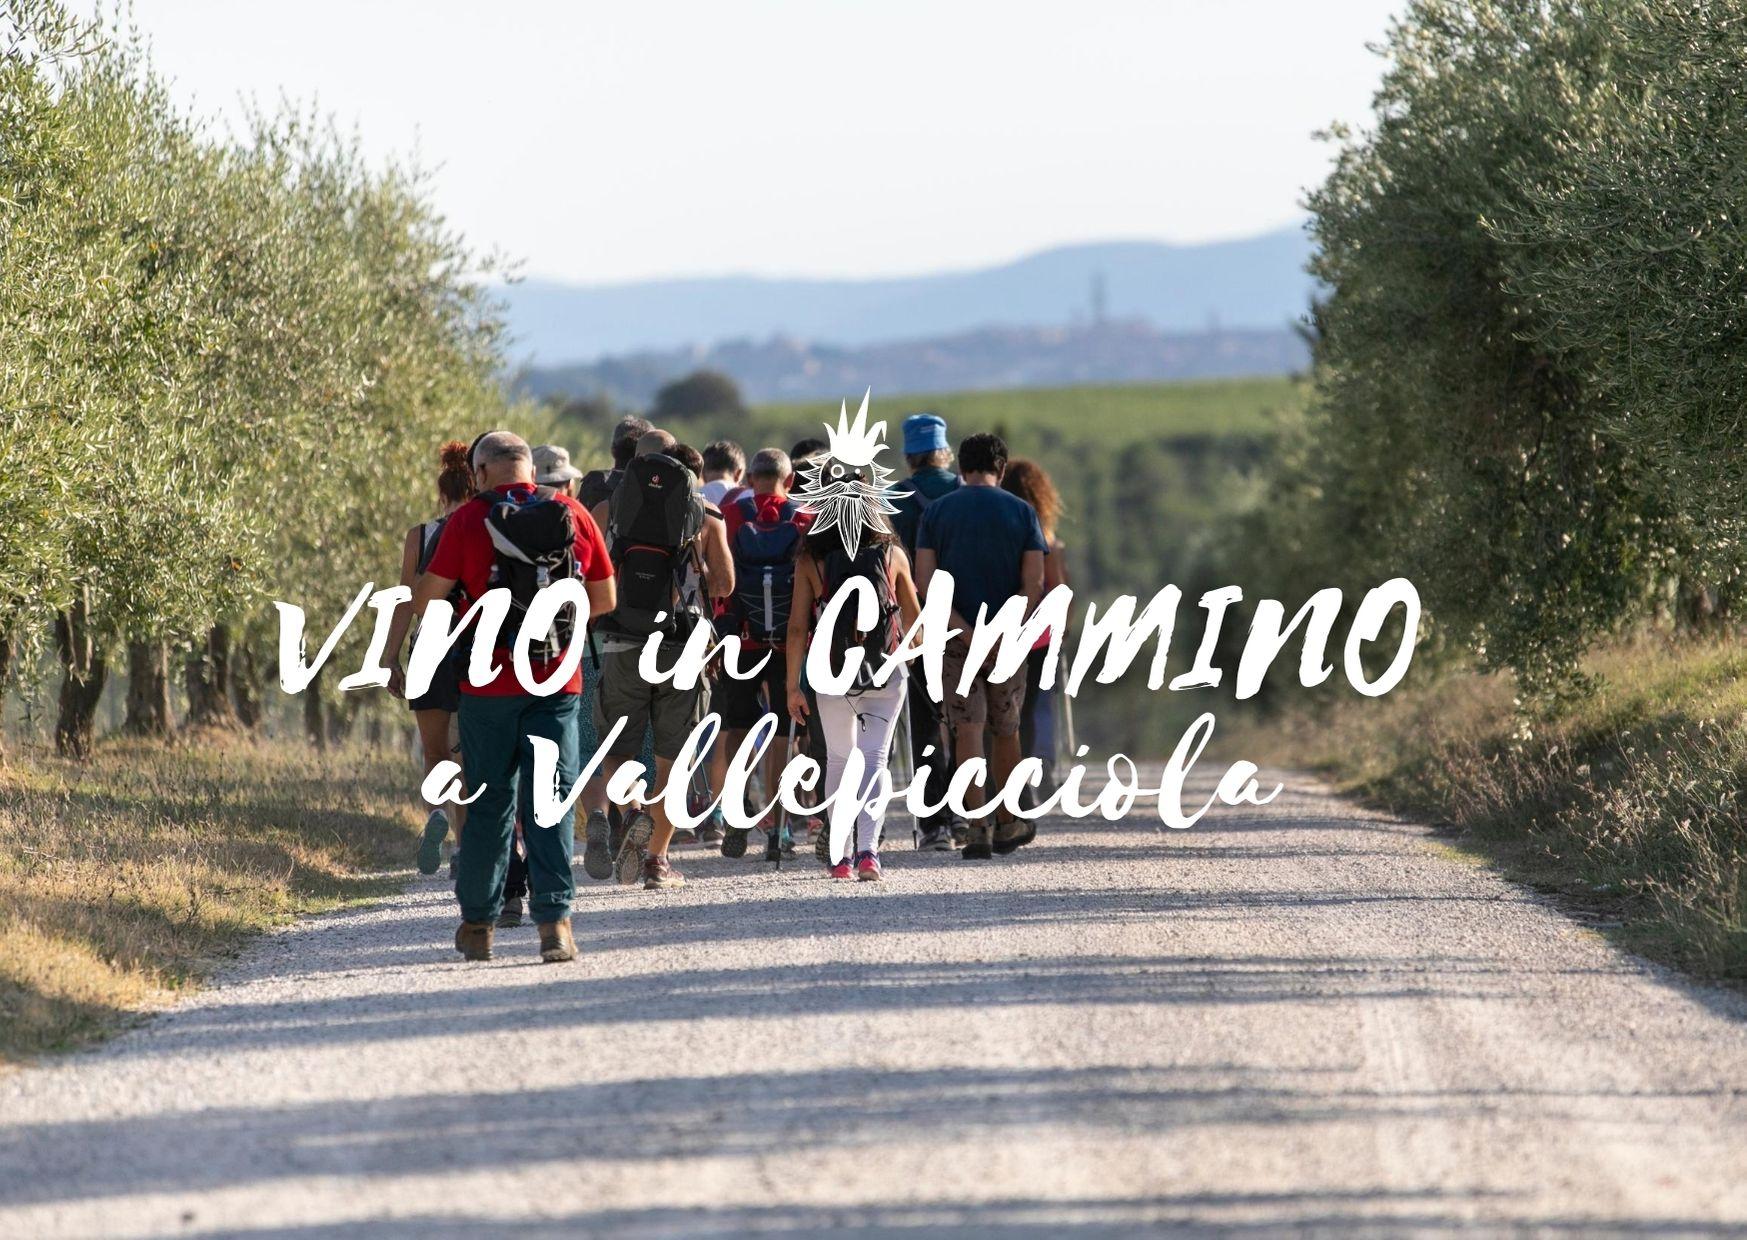 VINO in CAMMINO, with Sara Testi, Walking, Hiking and Tour Guide